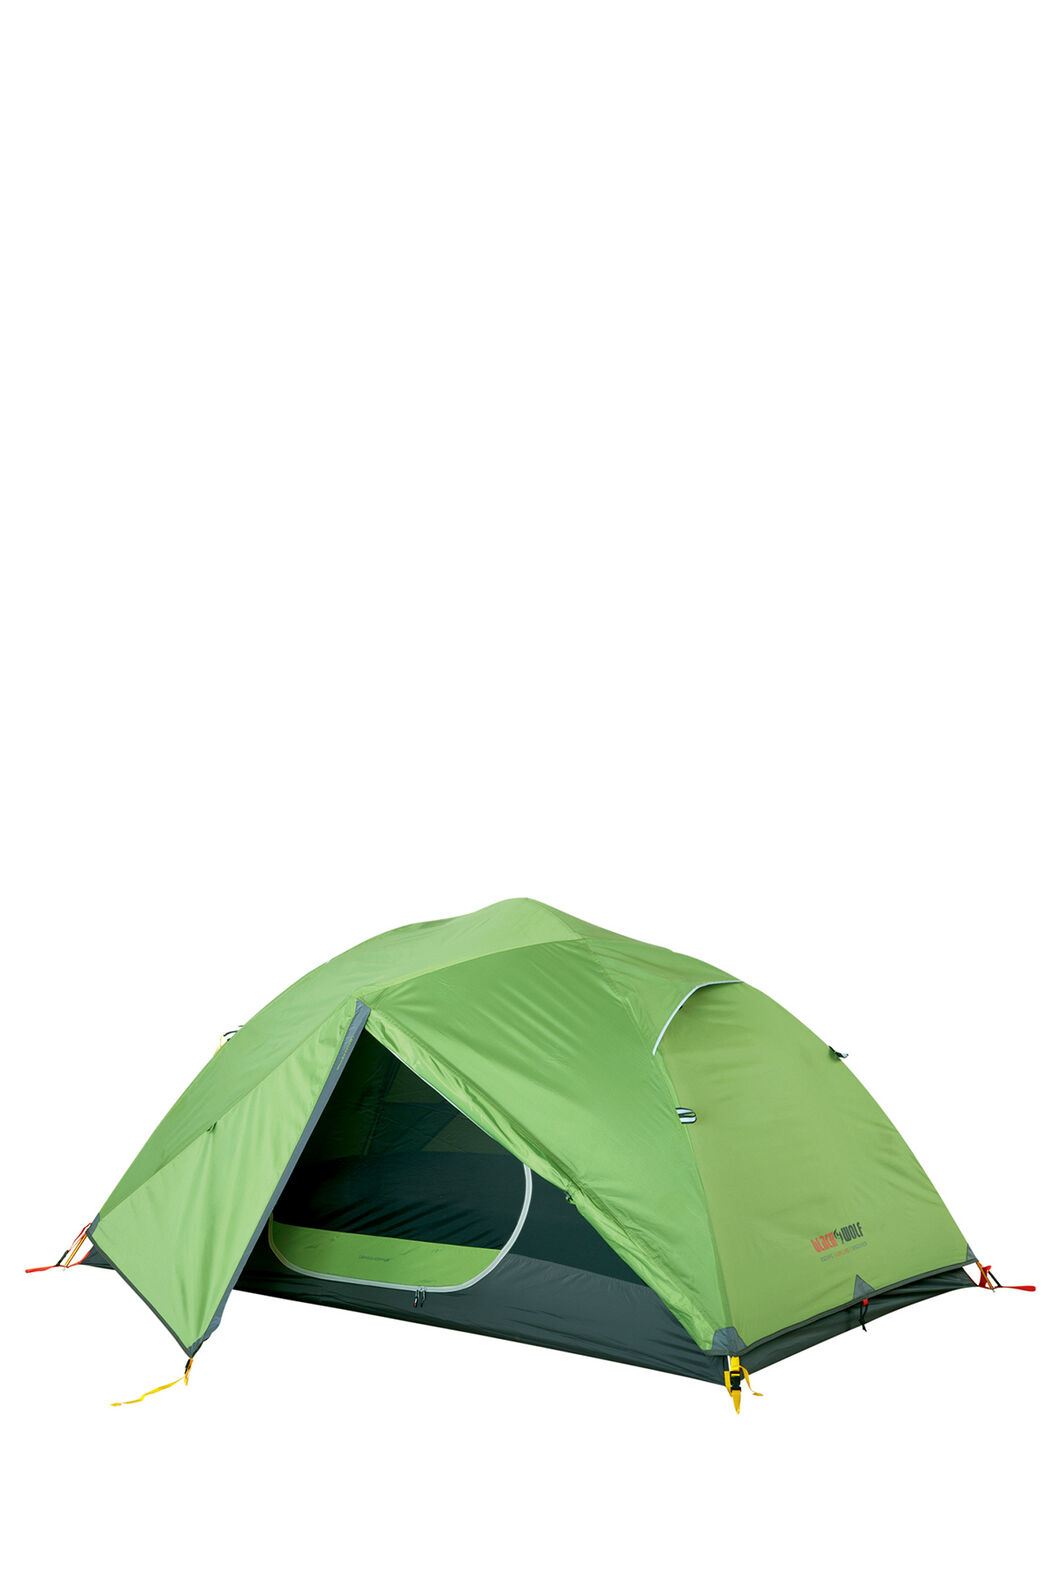 BlackWolf Grasshopper 3 Person Hiking Tent, None, hi-res